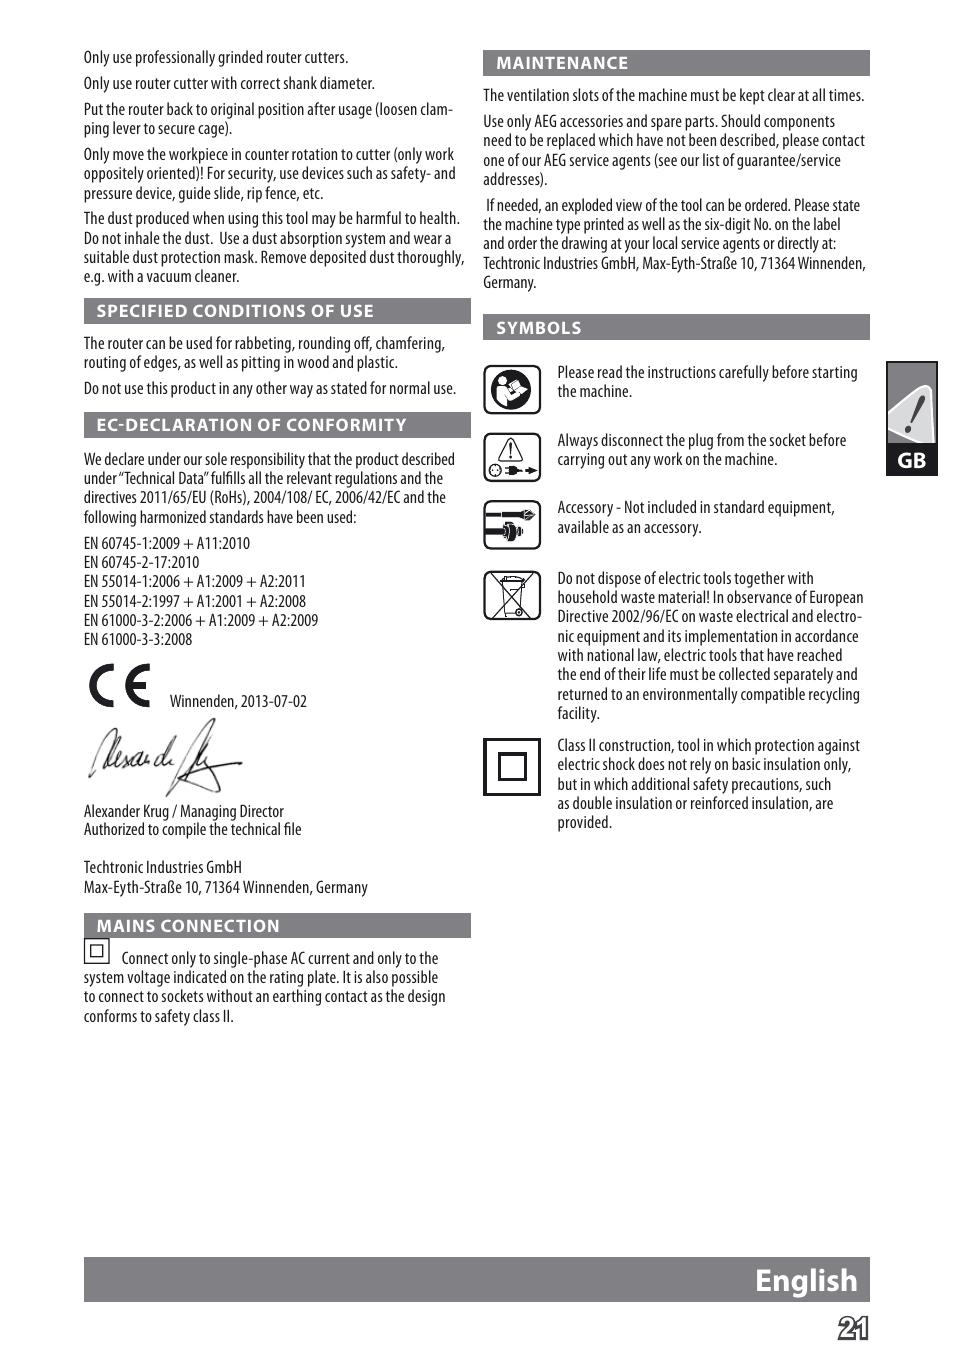 english aeg mf 1400 ke user manual page 23 76 original mode rh manualsdir com Operators Manual Operators Manual